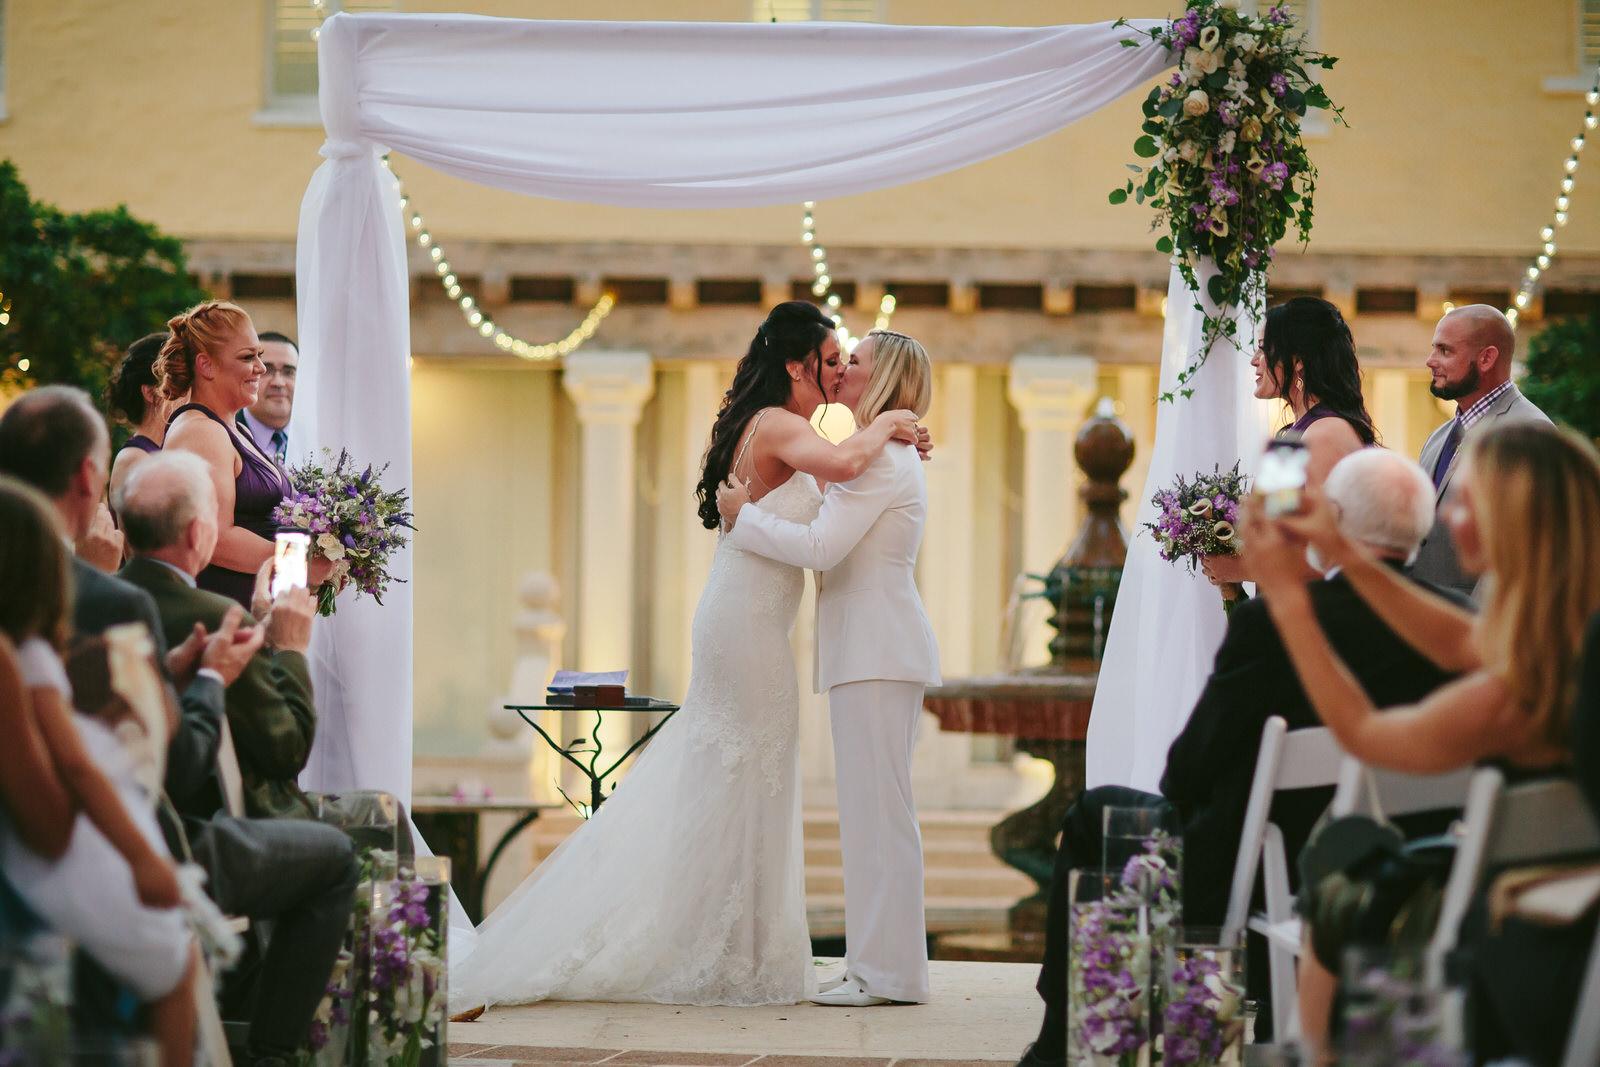 stephanie_lynn_weddings_tiny_house_photo_the_kiss_two_brides_wedding_photographer.jpg